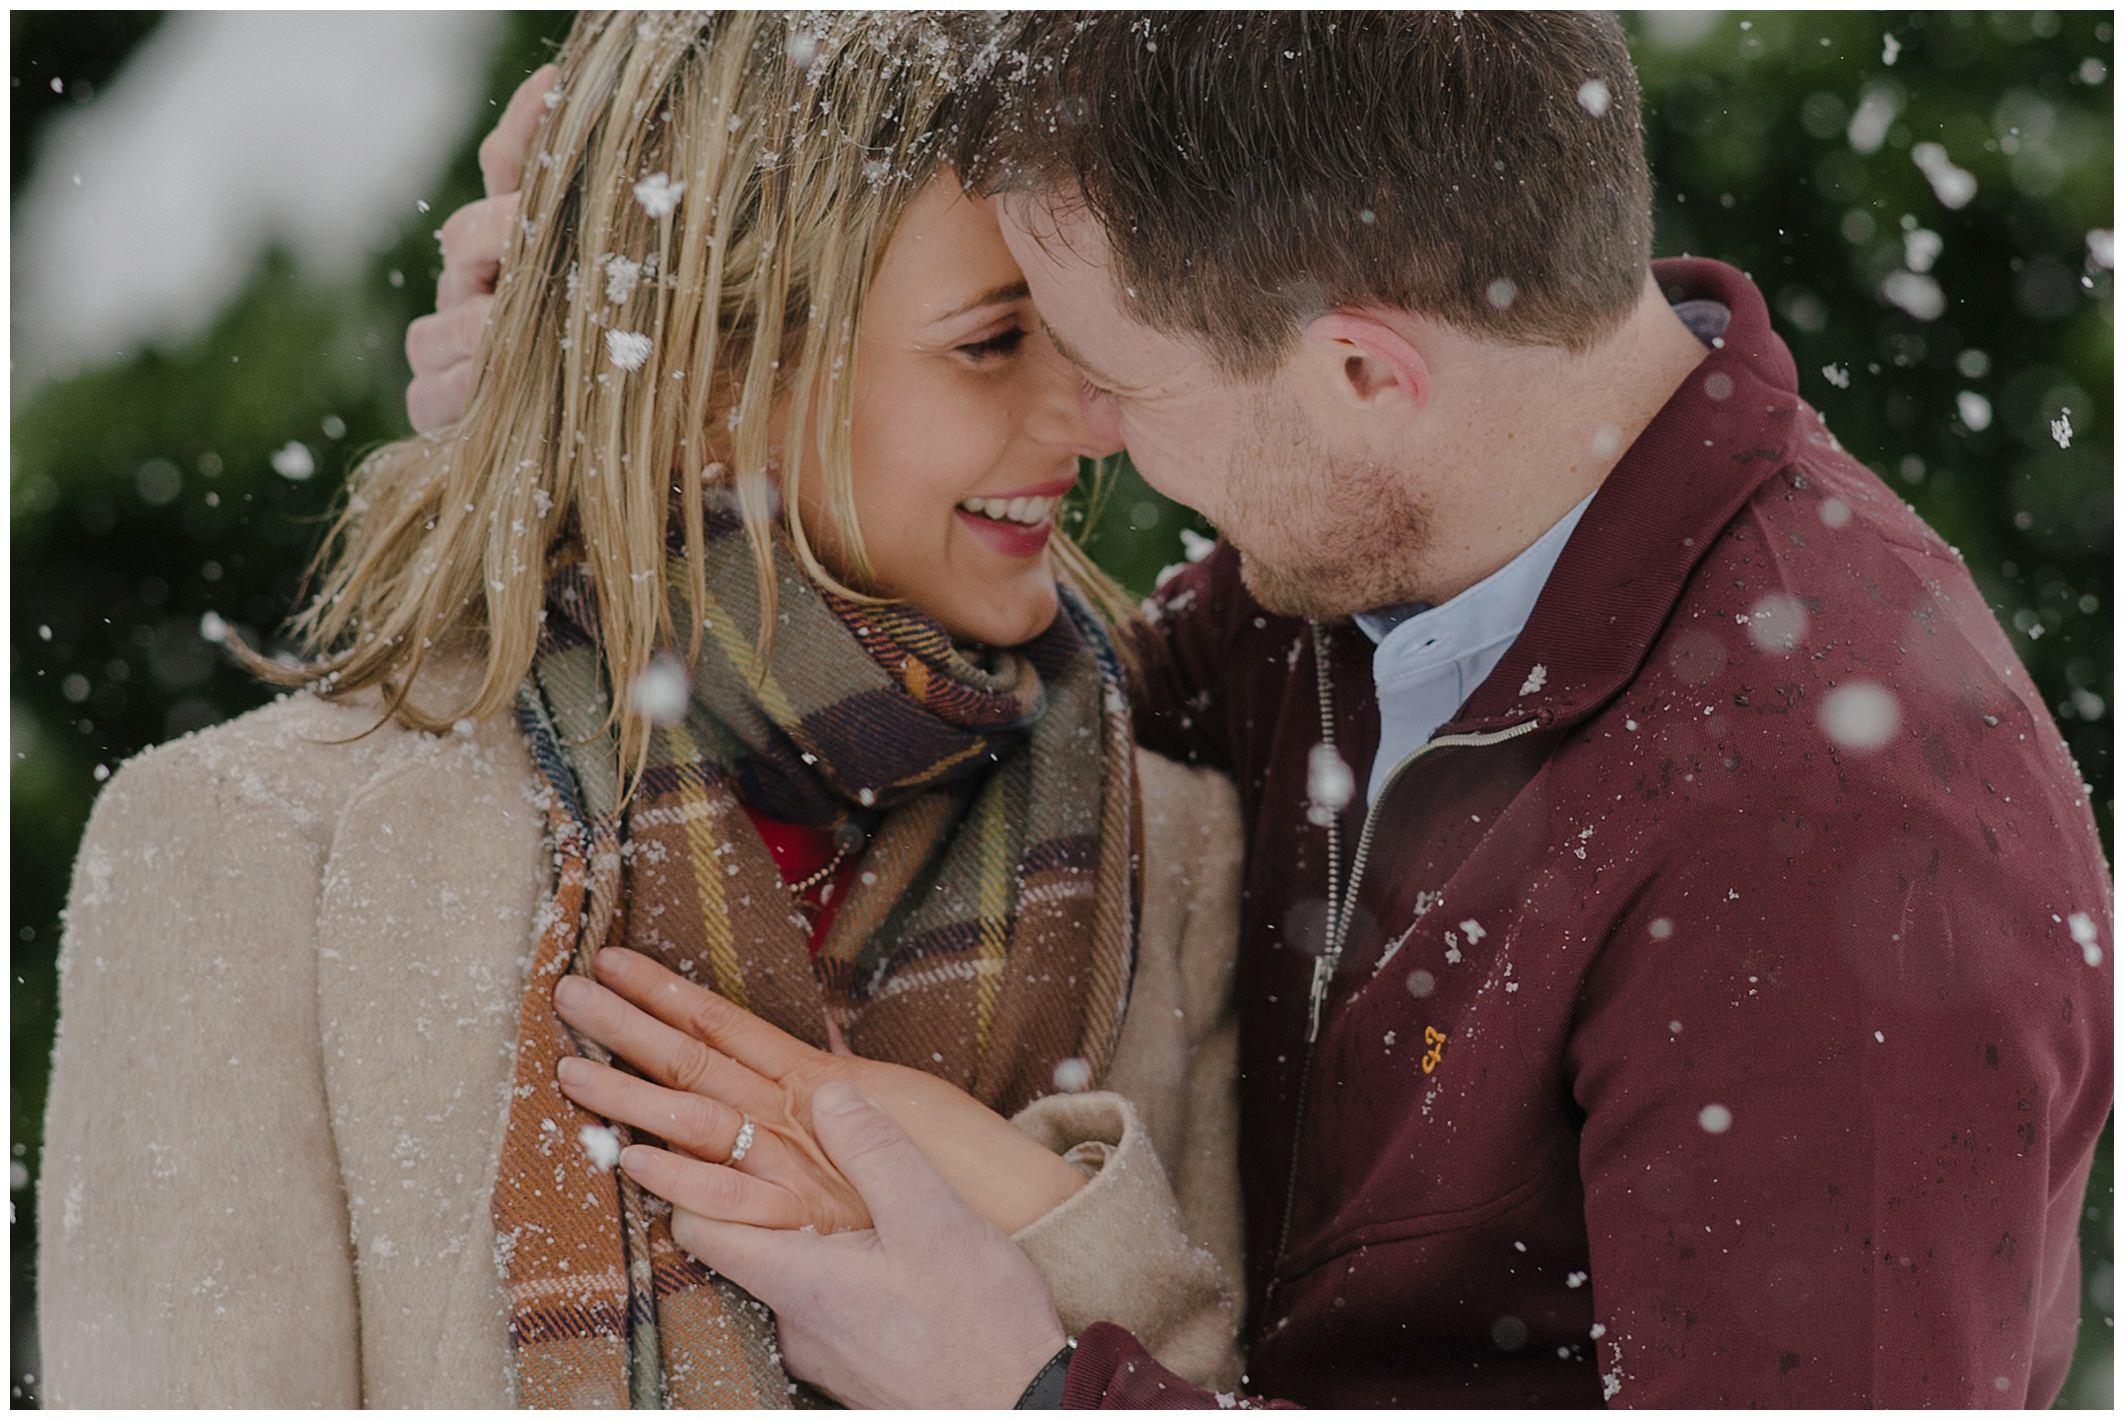 adela_rossa_pre_wedding_jude_browne_photography_0021.jpg